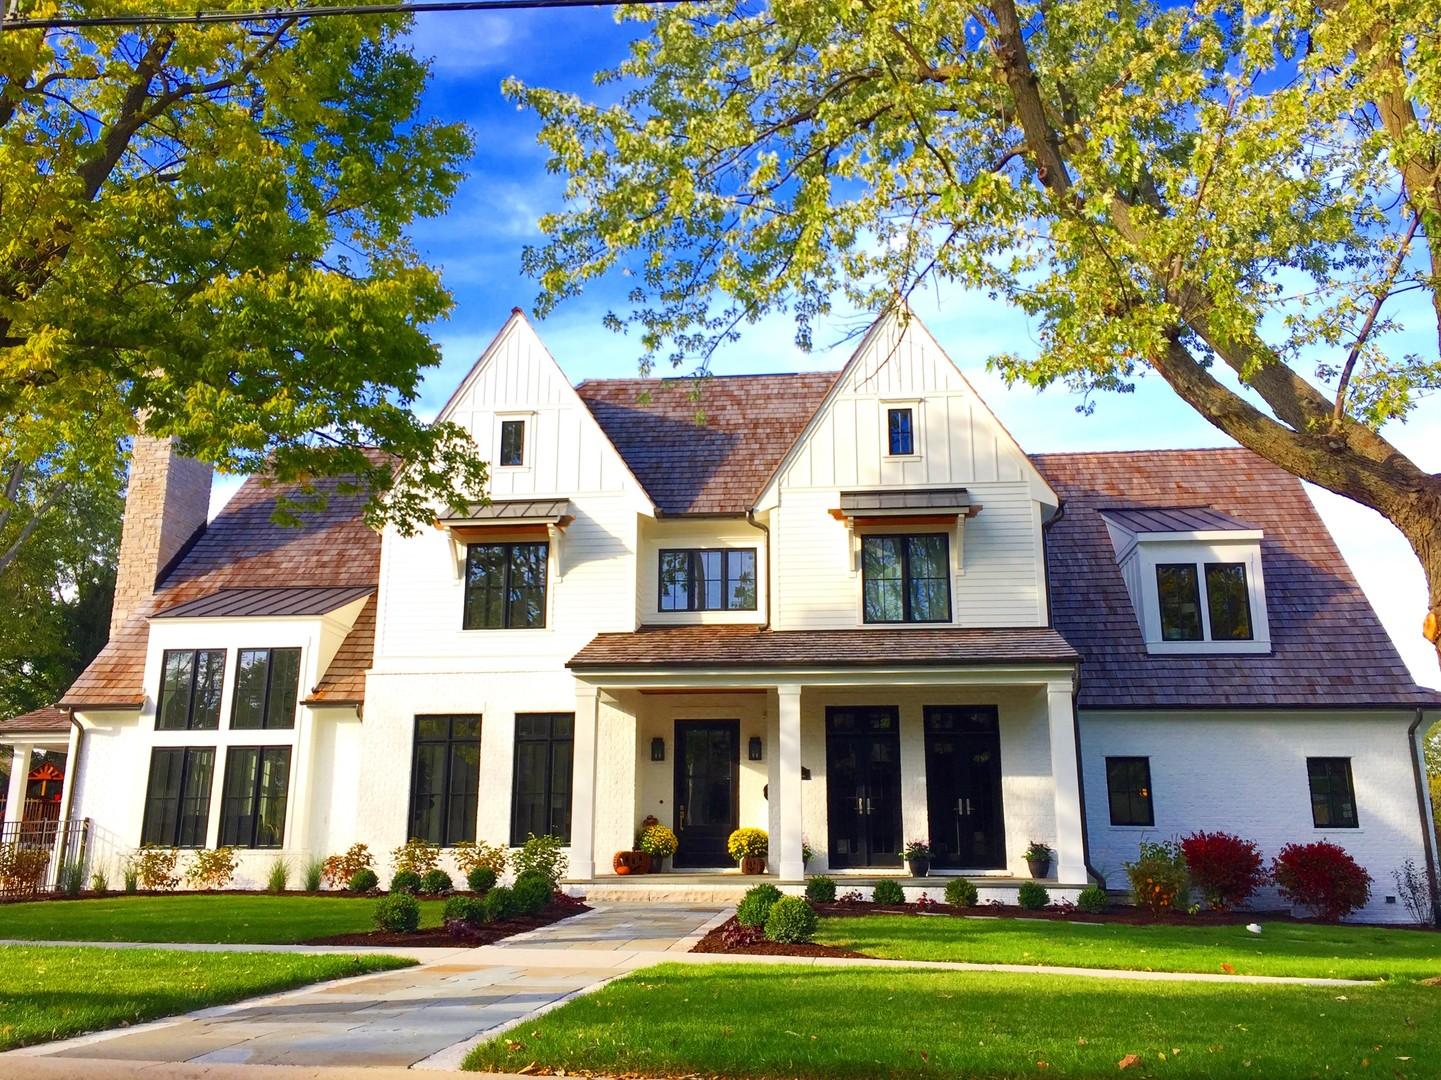 206 Grant ,Hinsdale, Illinois 60521